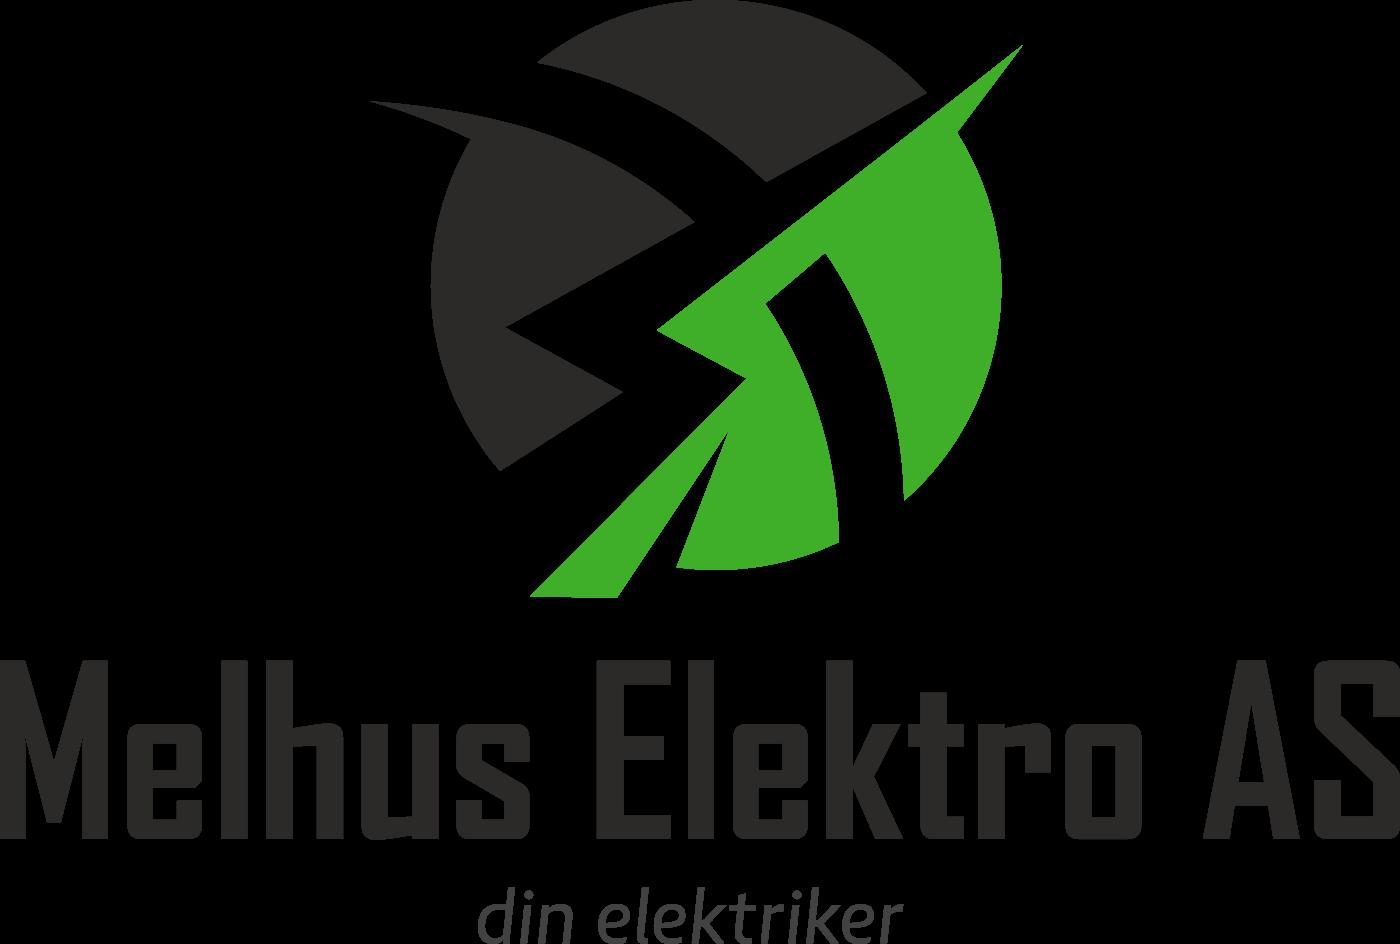 Melhus Elektro